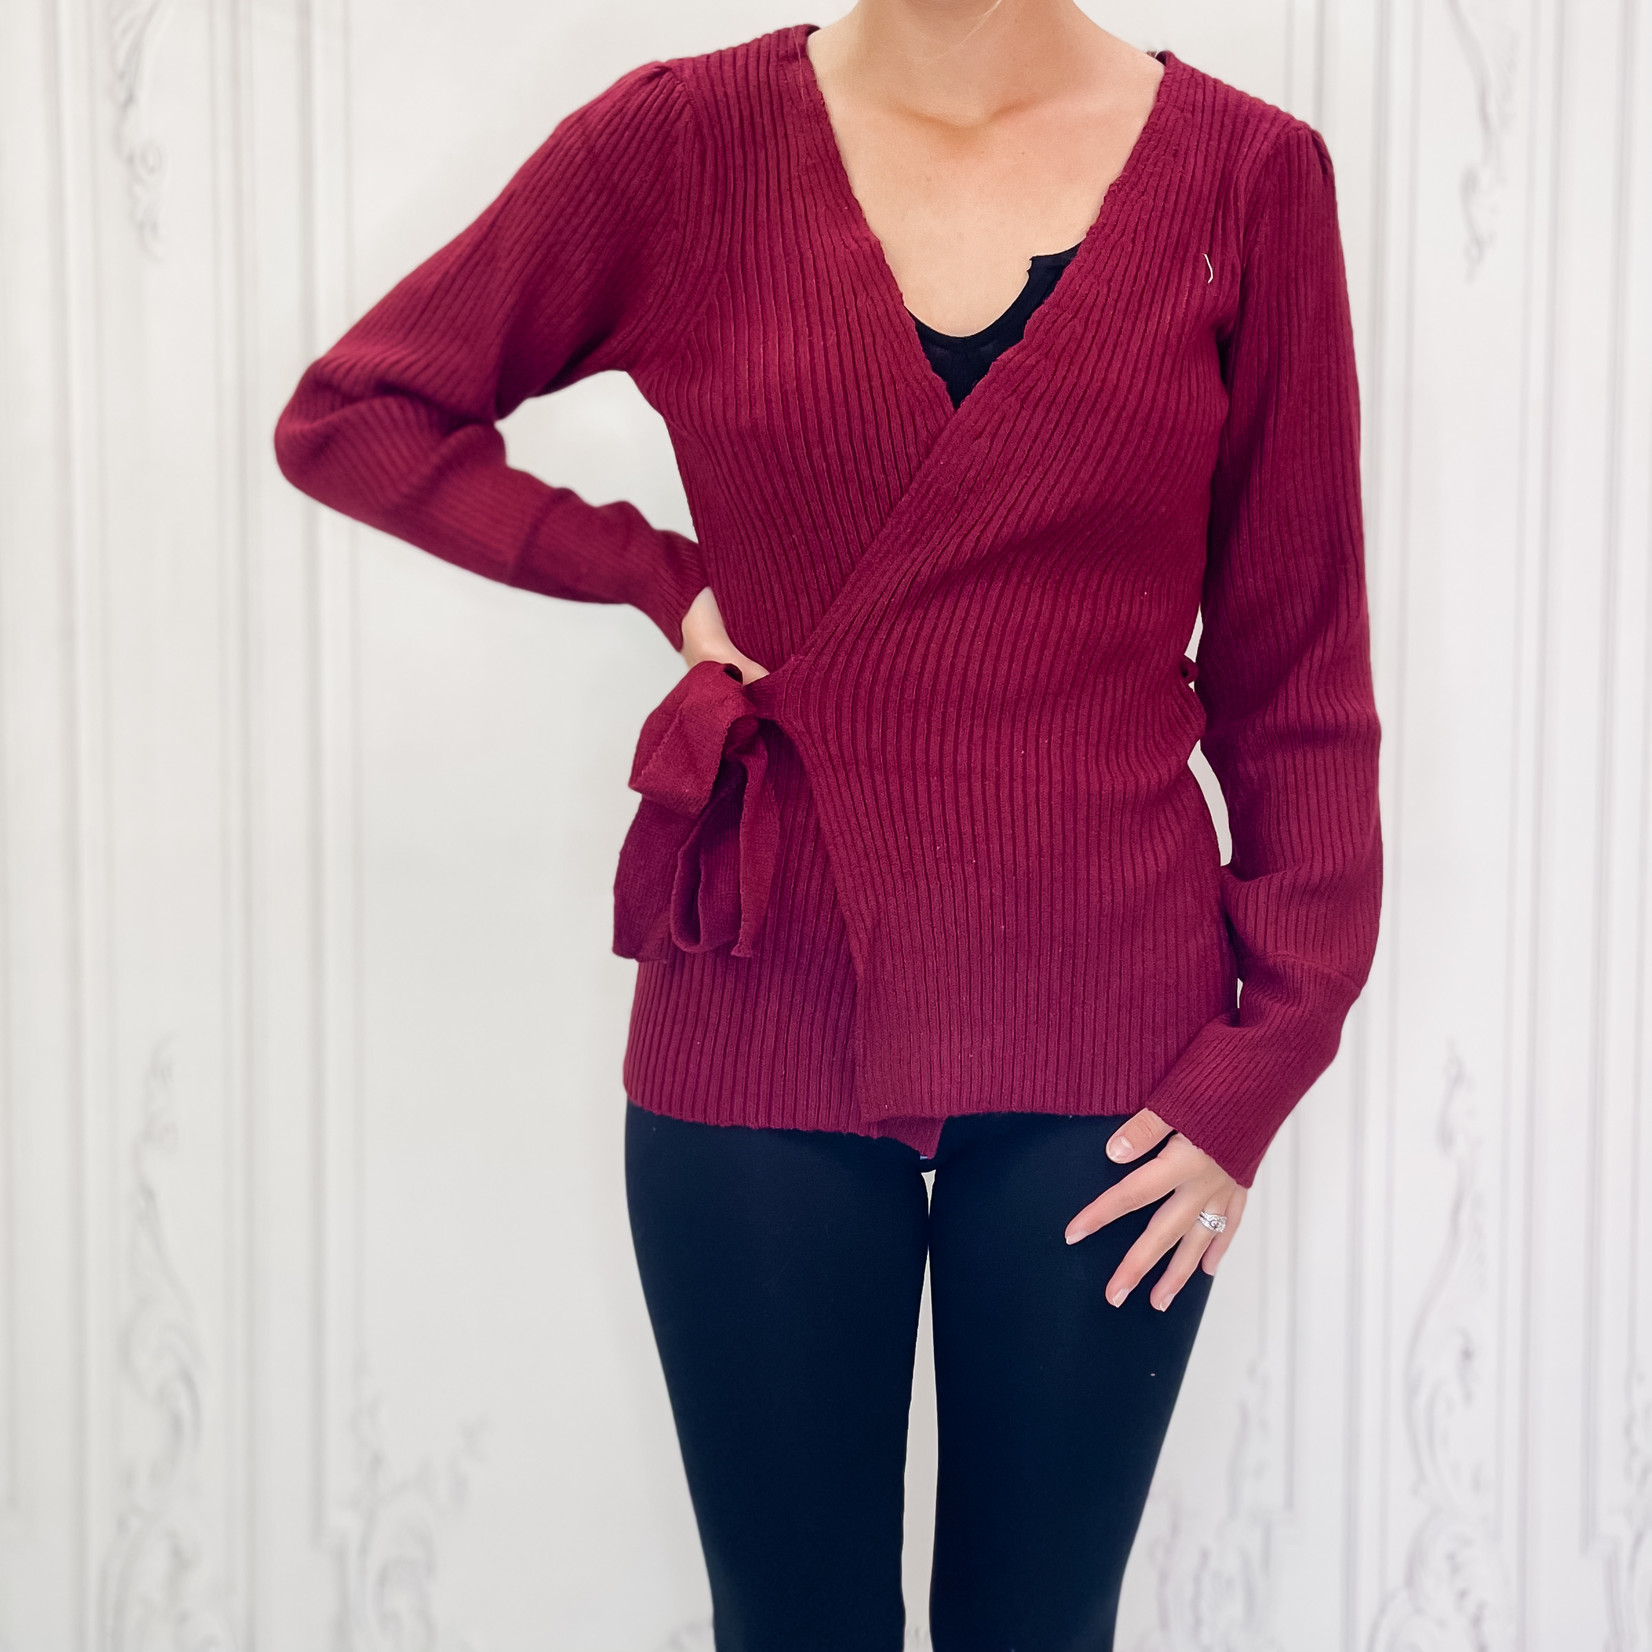 Illia wrap sweater